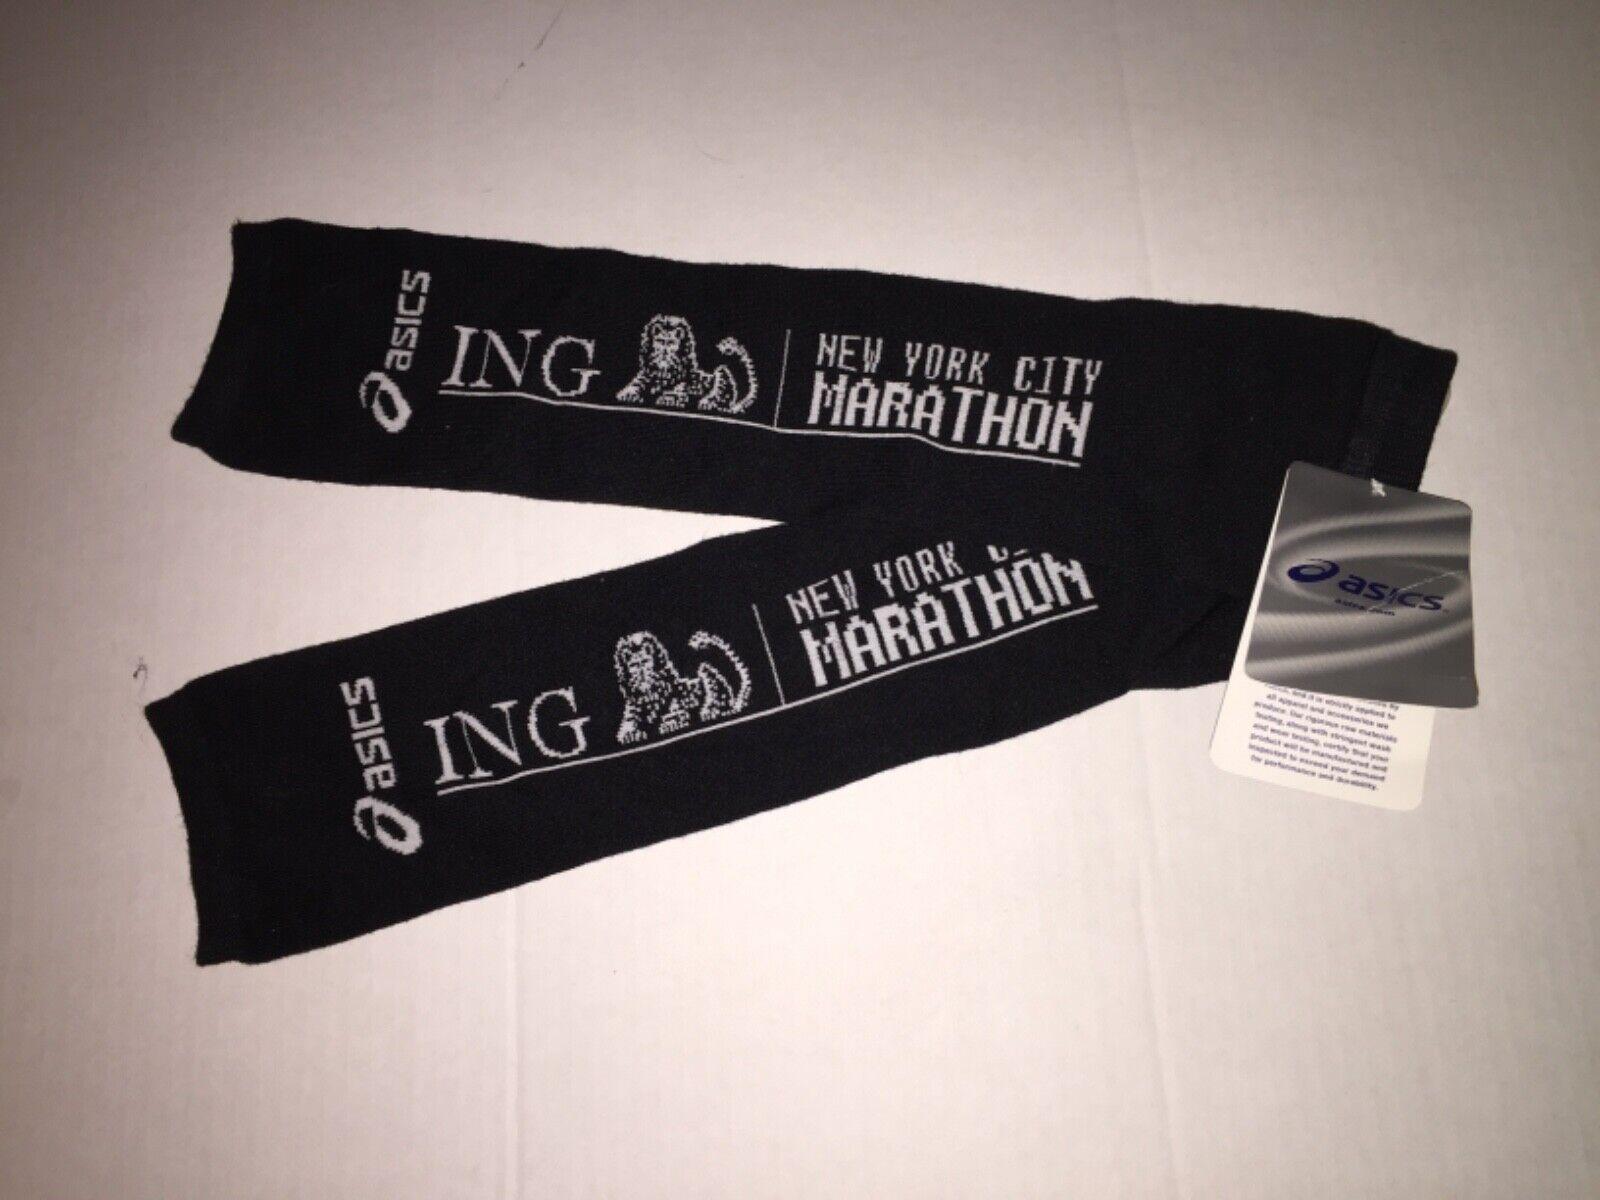 Asics New York City Marathon Arm Warmers for Running Thermal Jogging 1 pair